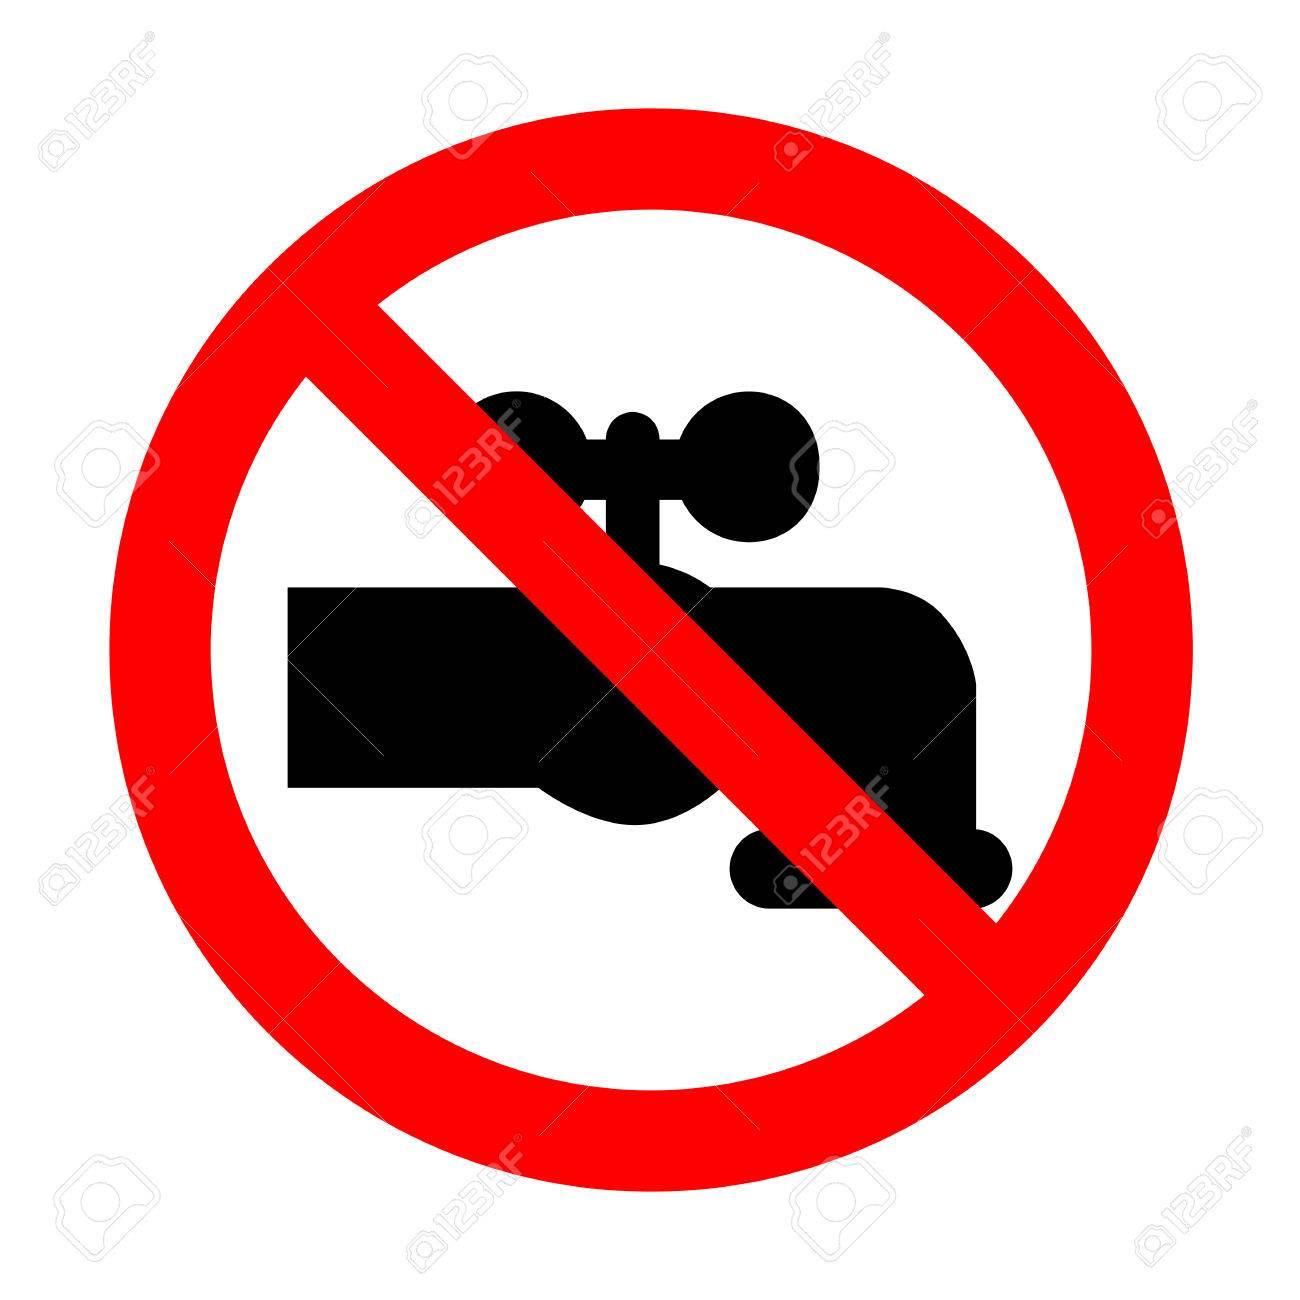 No Water Faucet Sign Illustration. Royalty Free Cliparts, Vectors ...